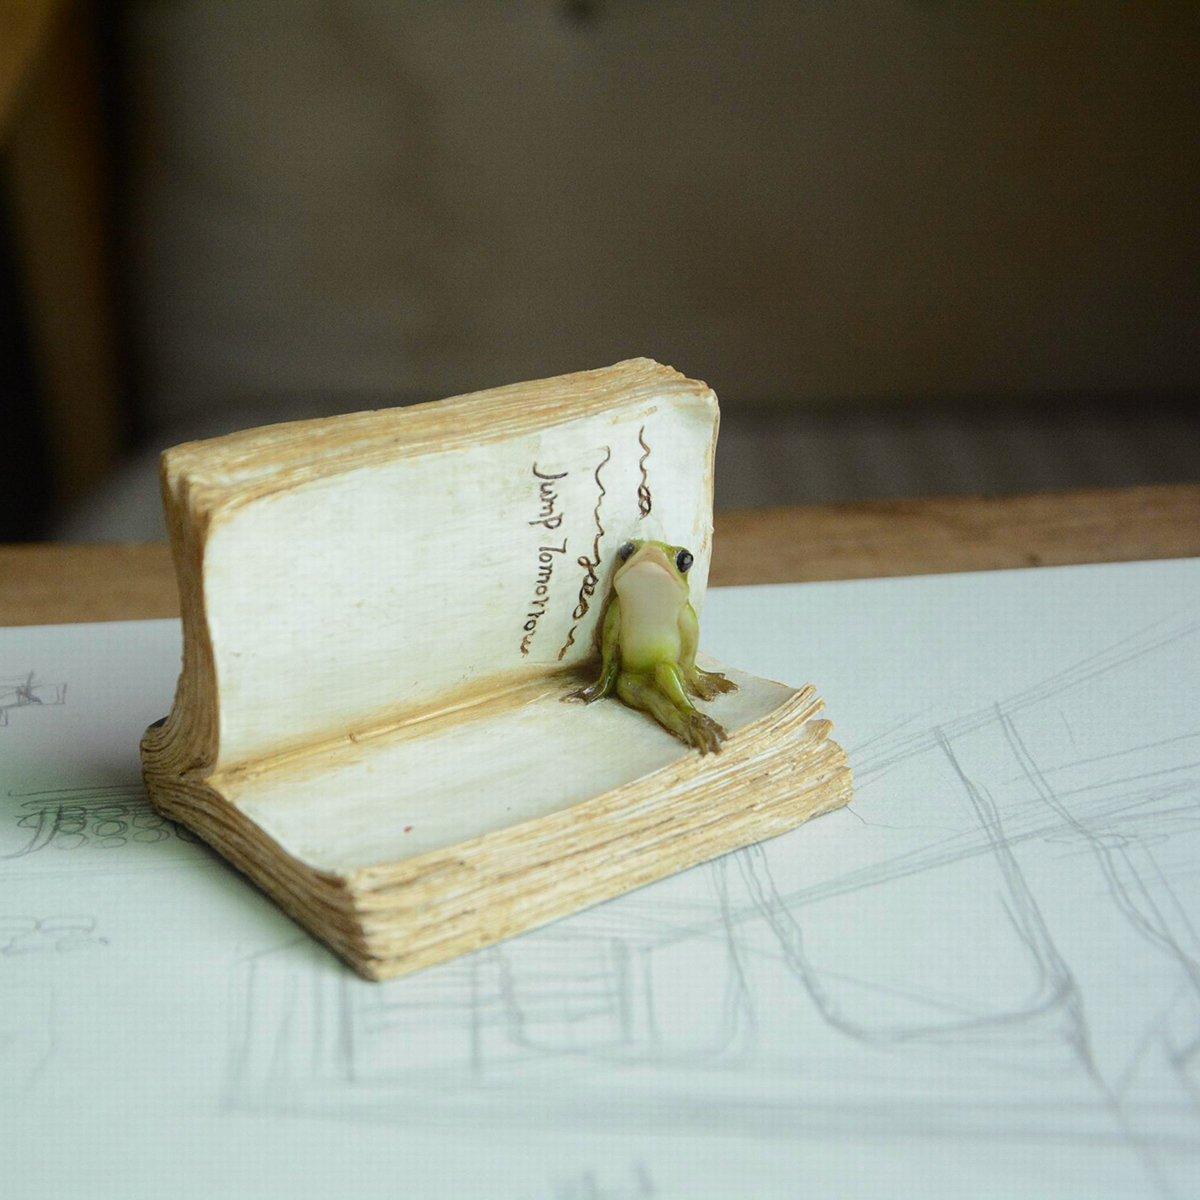 Top Collection Miniature Fairy Garden and Terrarium Frog on Book Figurine